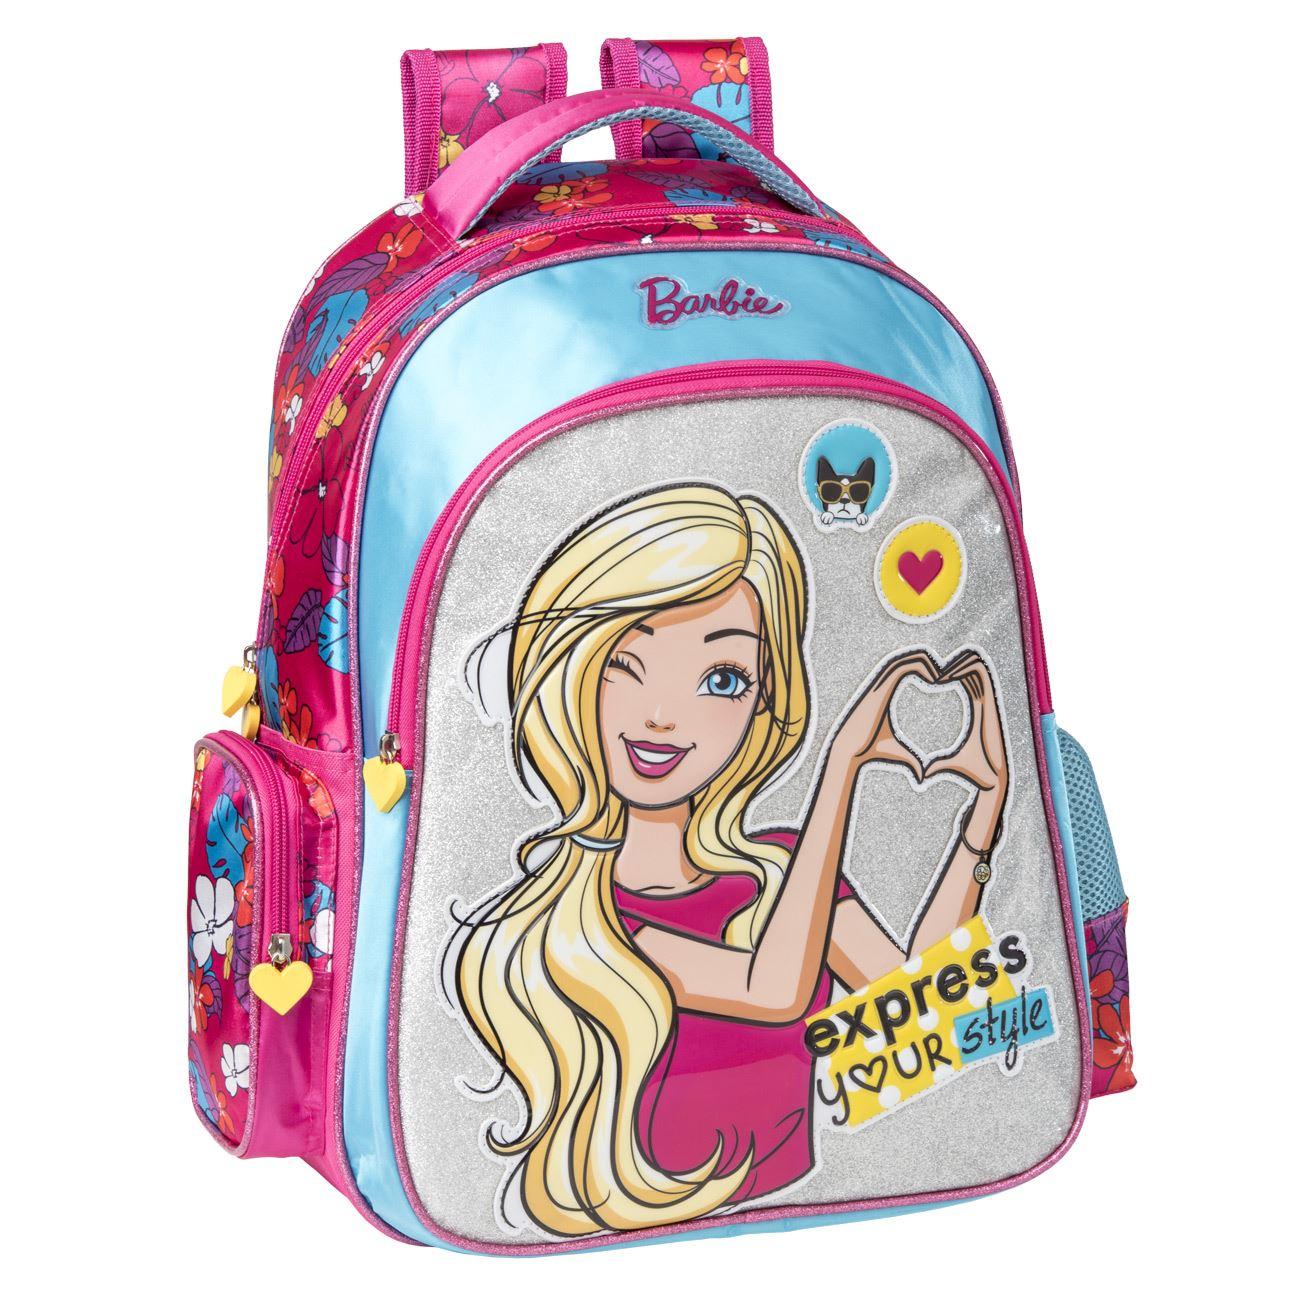 42376359e1e Σχολική Τσάντα Δημοτικού BARBIE < Τσάντες Δημοτικού για Κορίτσια | Jumbo